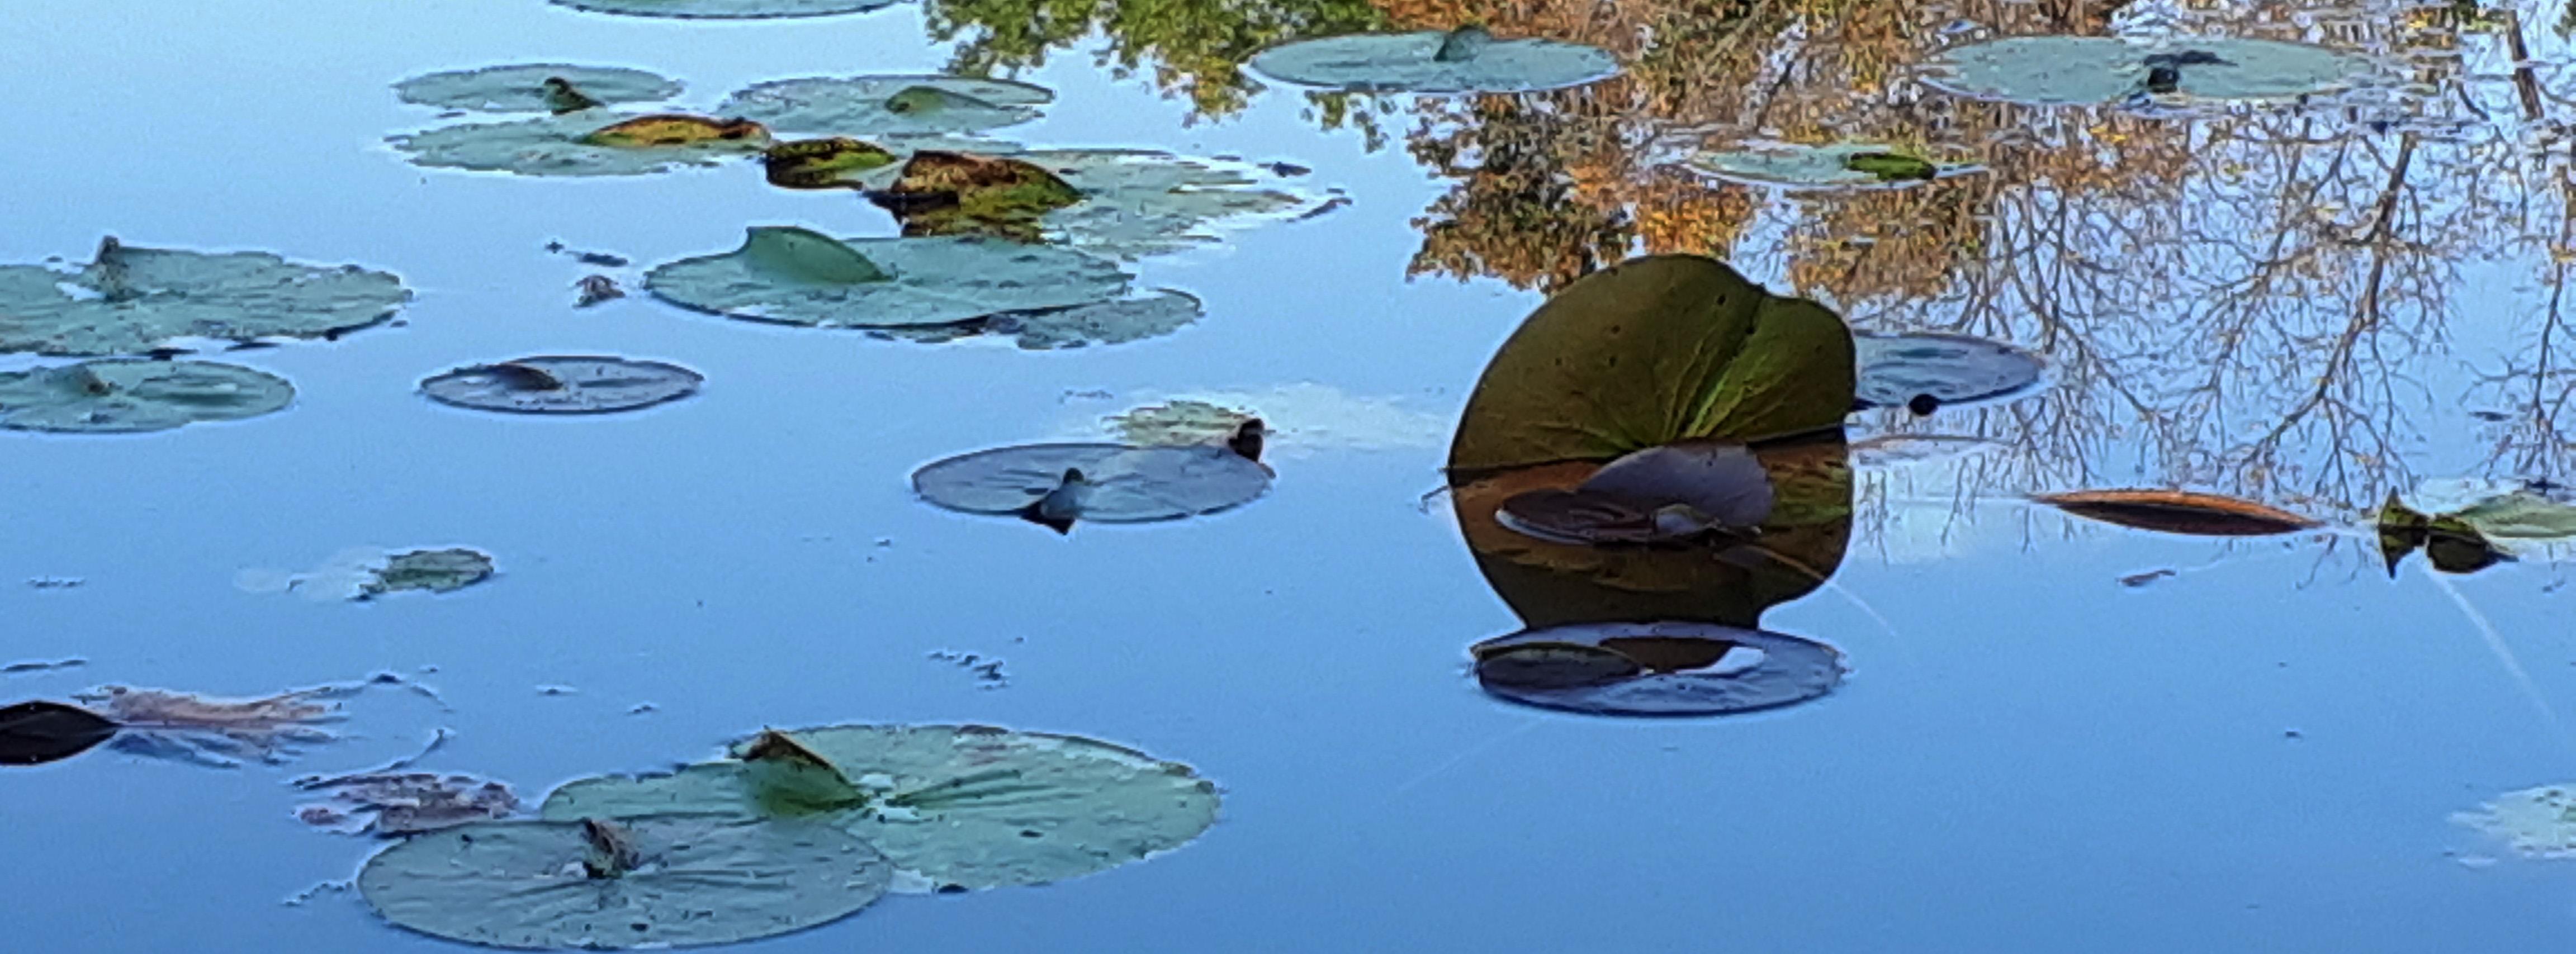 lotus_banner.jpg